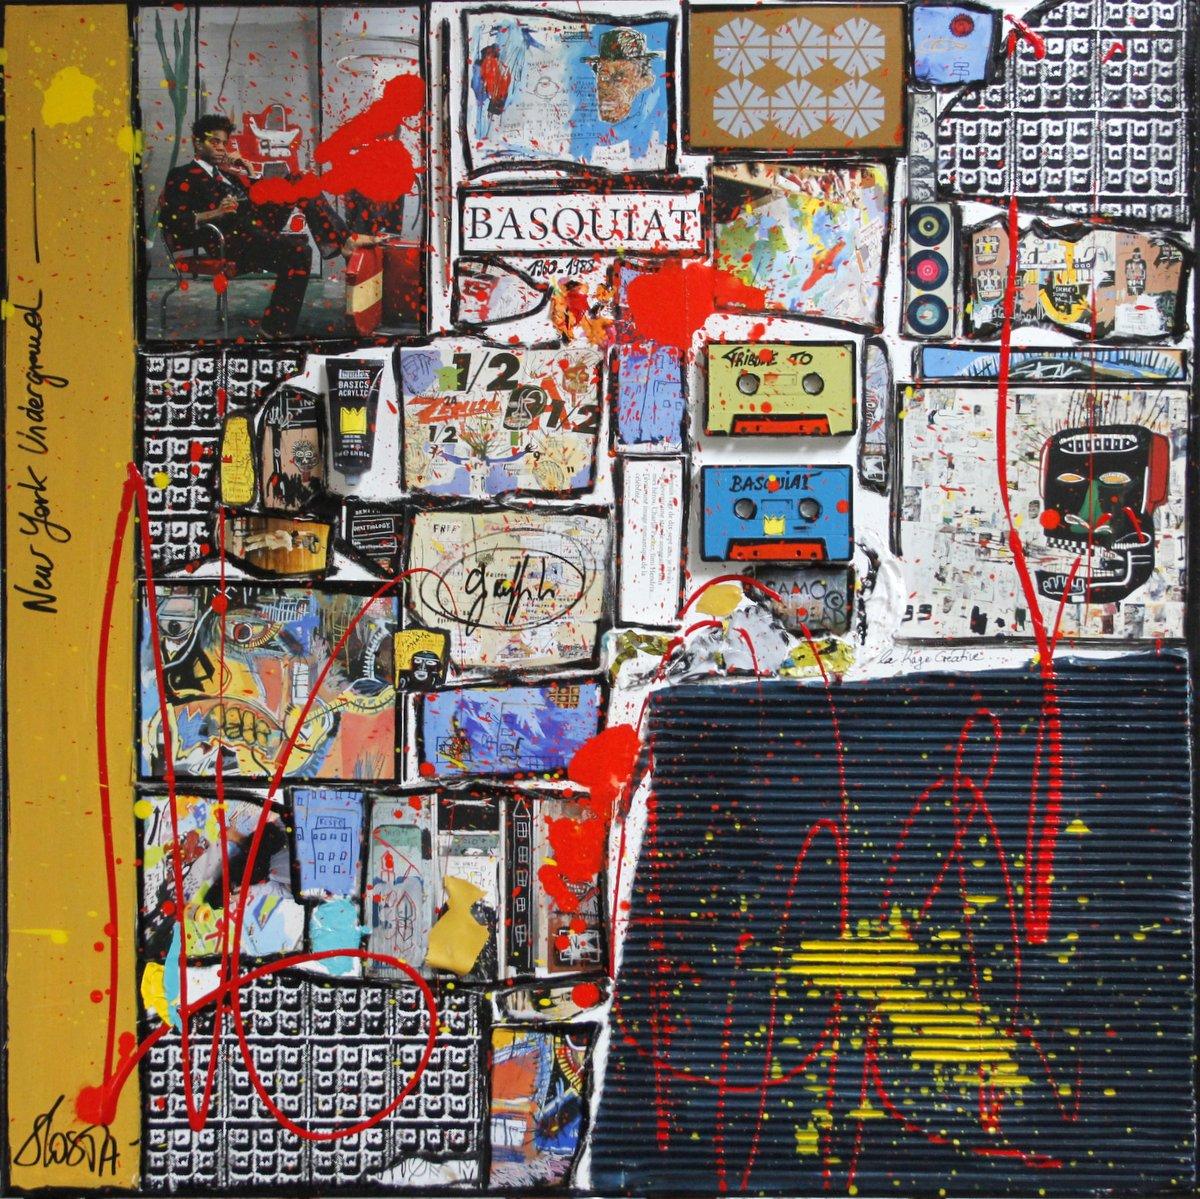 collage, basquiat, new york Tableau Contemporain, Basquiat, the one !. Sophie Costa, artiste peintre.